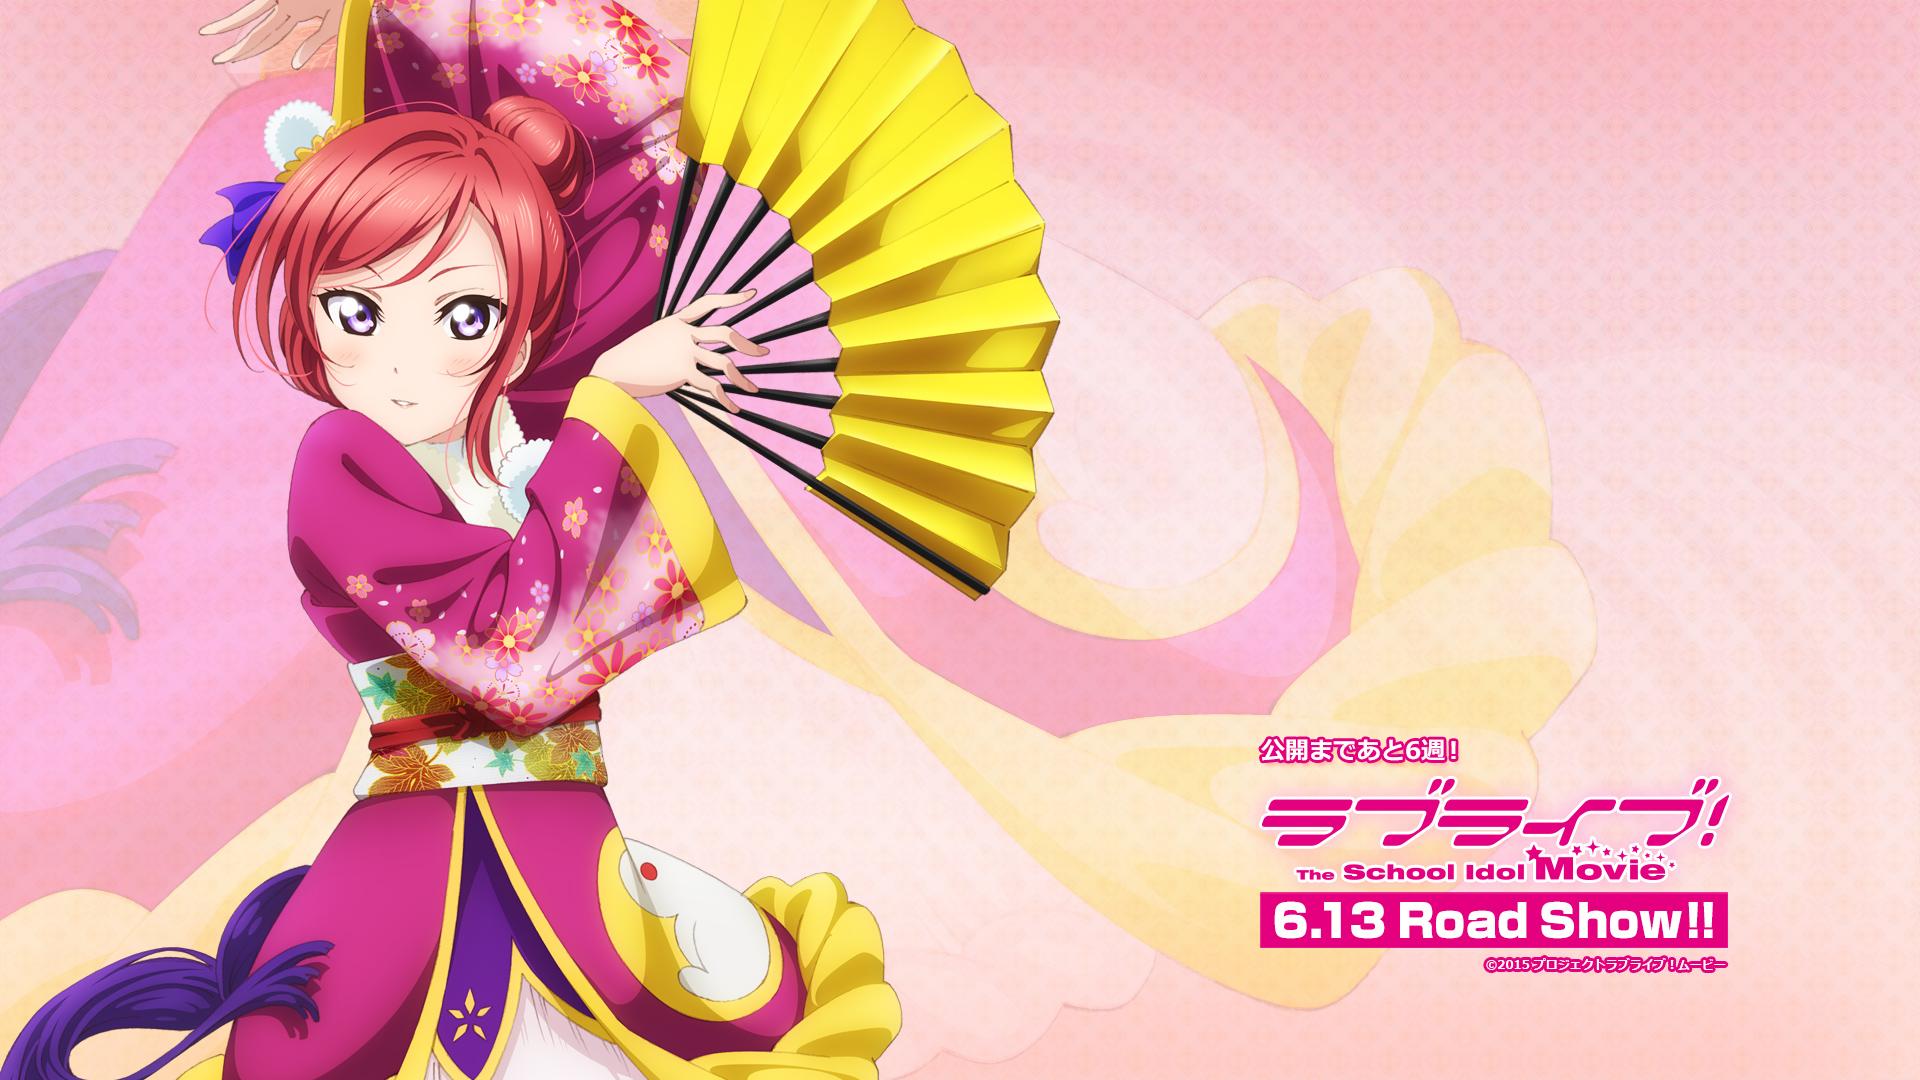 Love live 1920x1080 id 776784 wallpaper - Love live wallpaper 540x960 ...